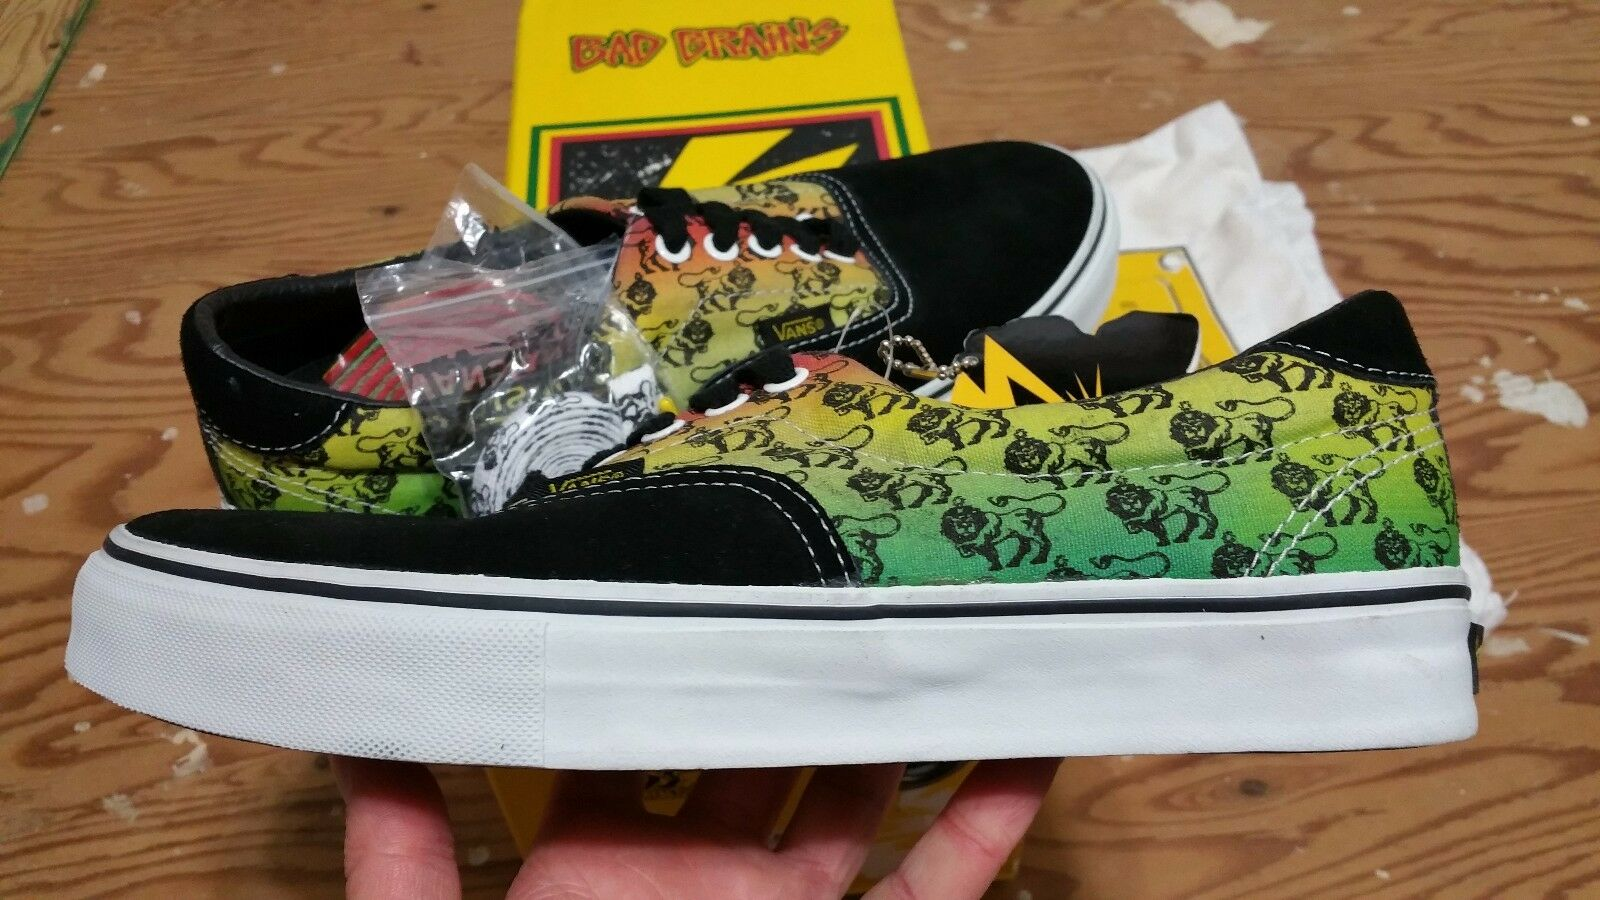 Vans x Bad Brains 46 LE Yellow Yellow Yellow Black Size 9.5 hosoi wtaps syndicate supreme 574650